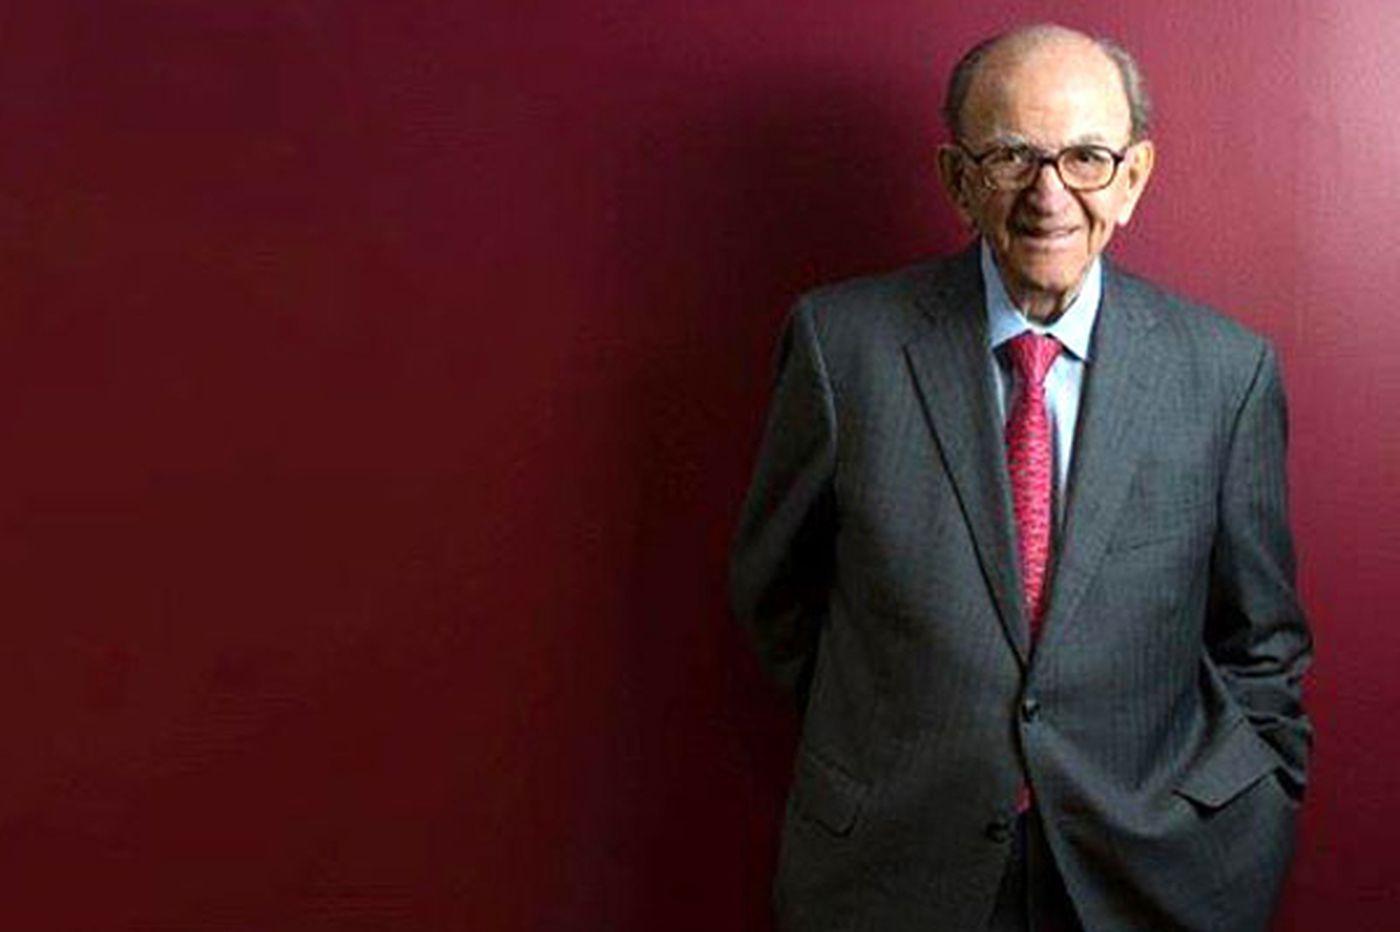 Nicholas A. Kefalides, 86, physician, educator